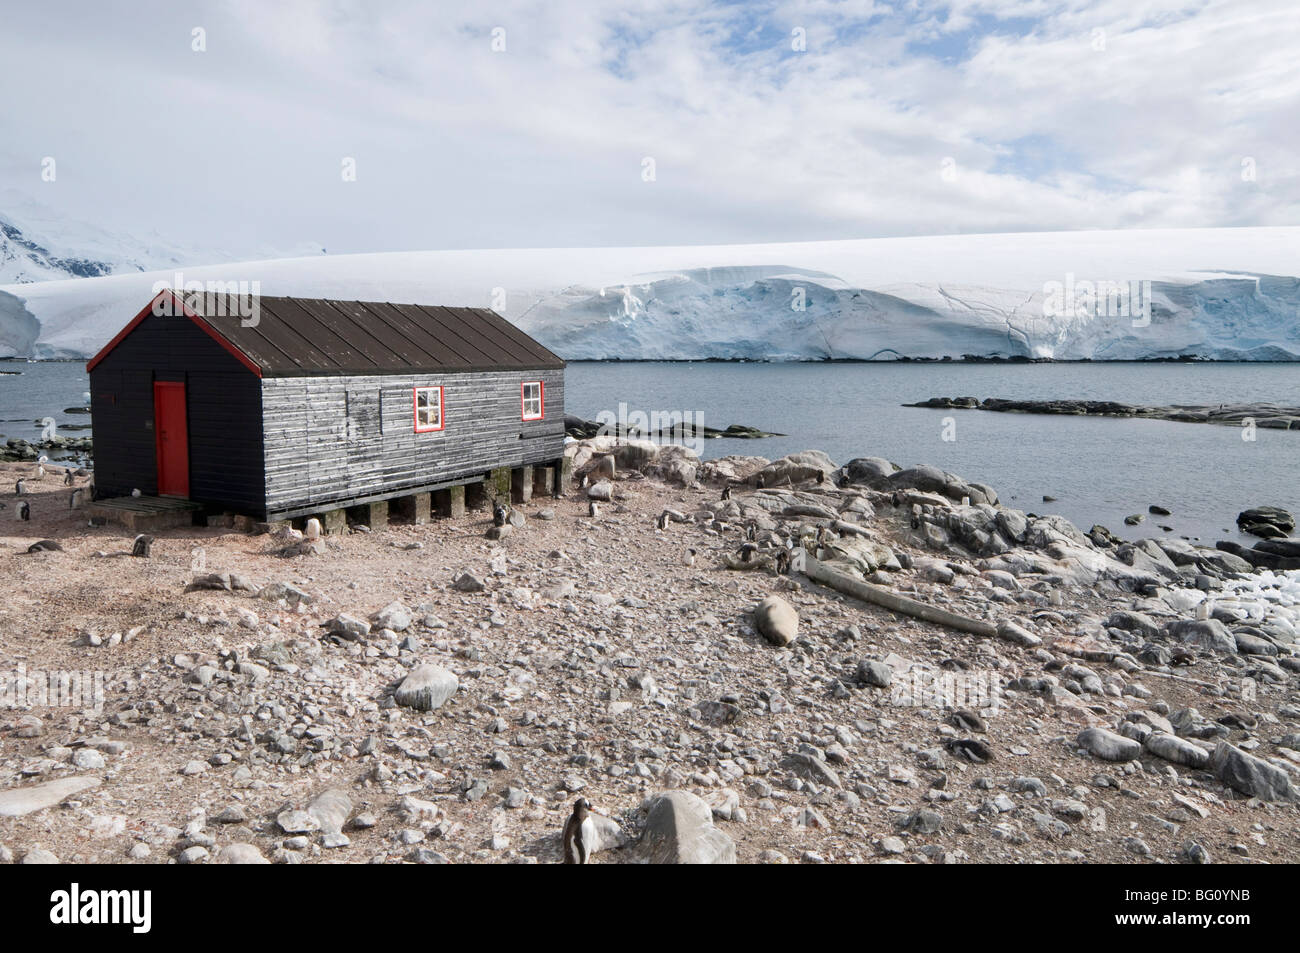 British Base and Post Office, Port Lockroy, Antarctic Peninsula, Antarctica, Polar Regions Stock Photo